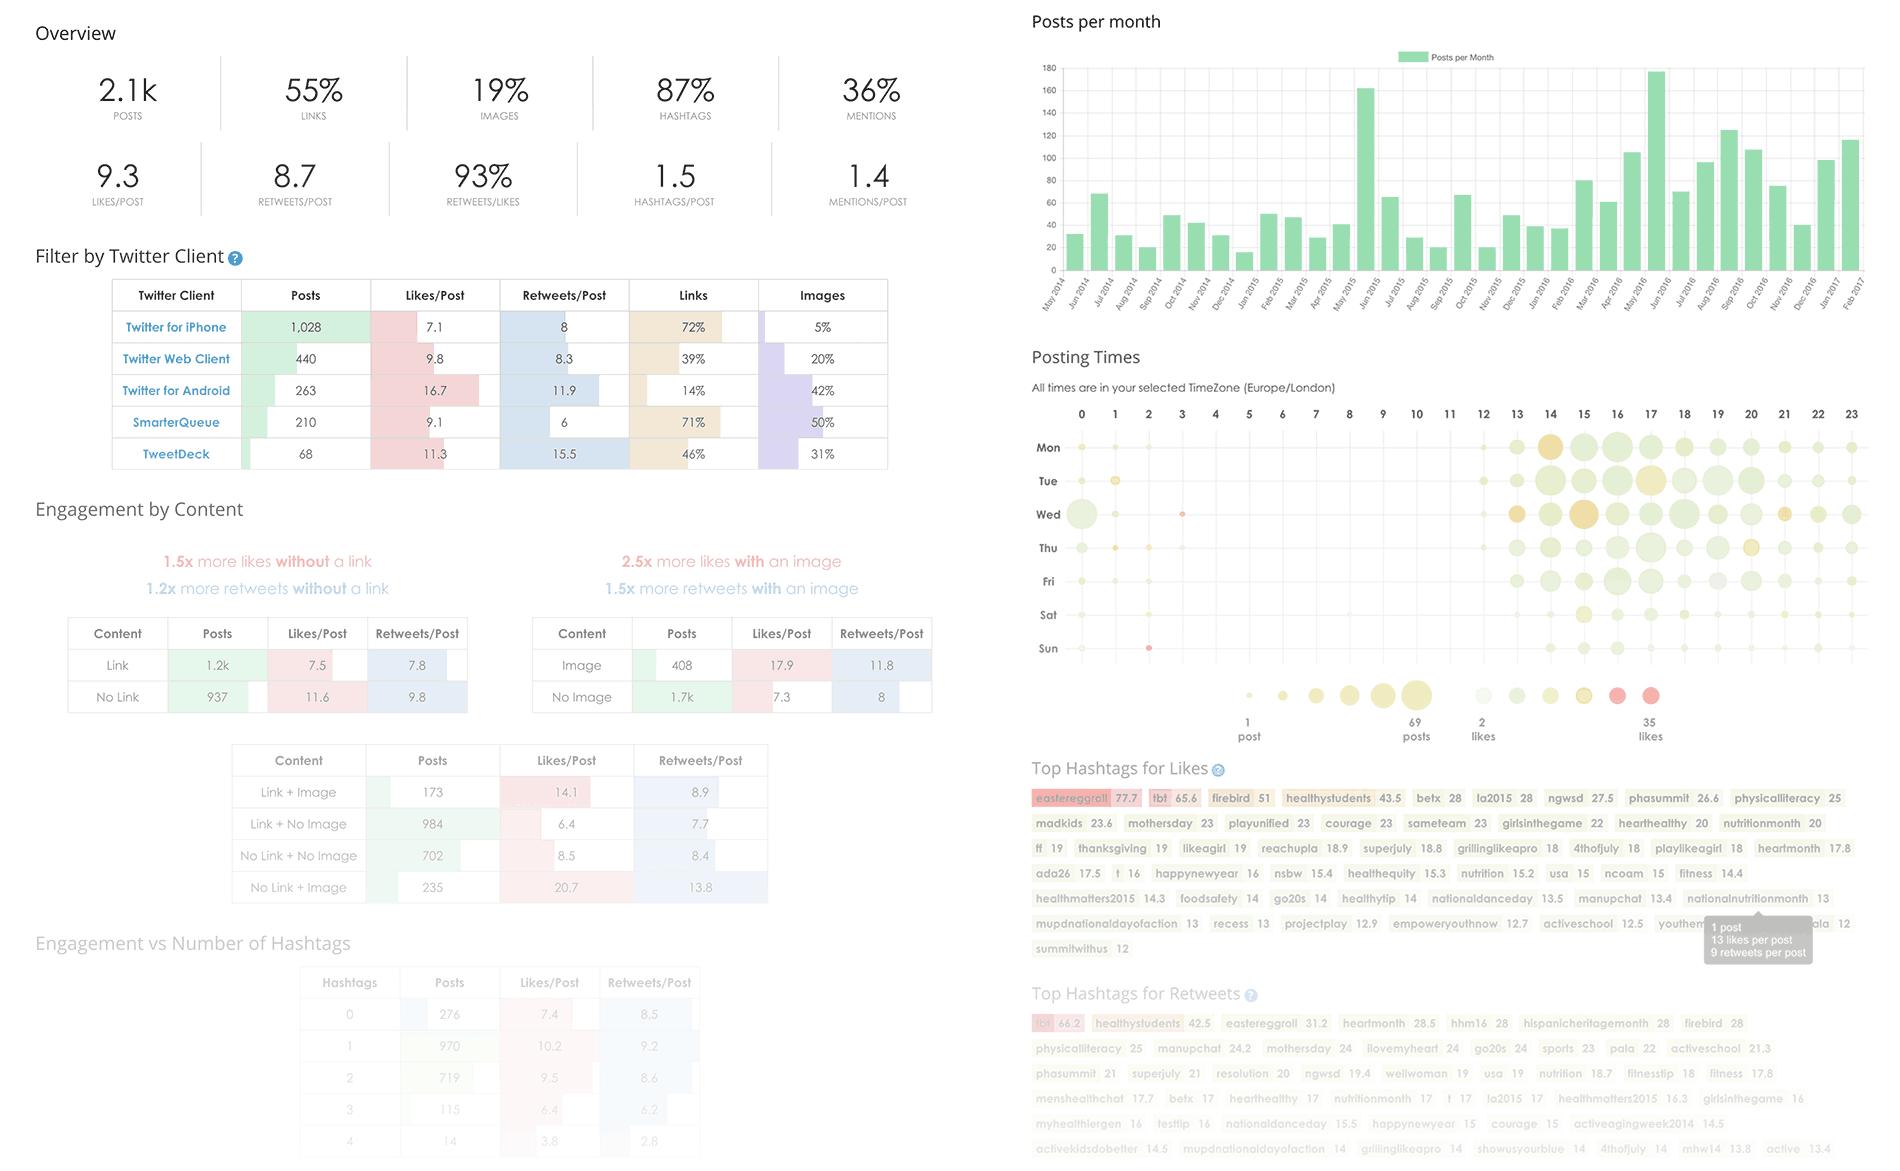 SmarterQueue Social Media Analytics Overview